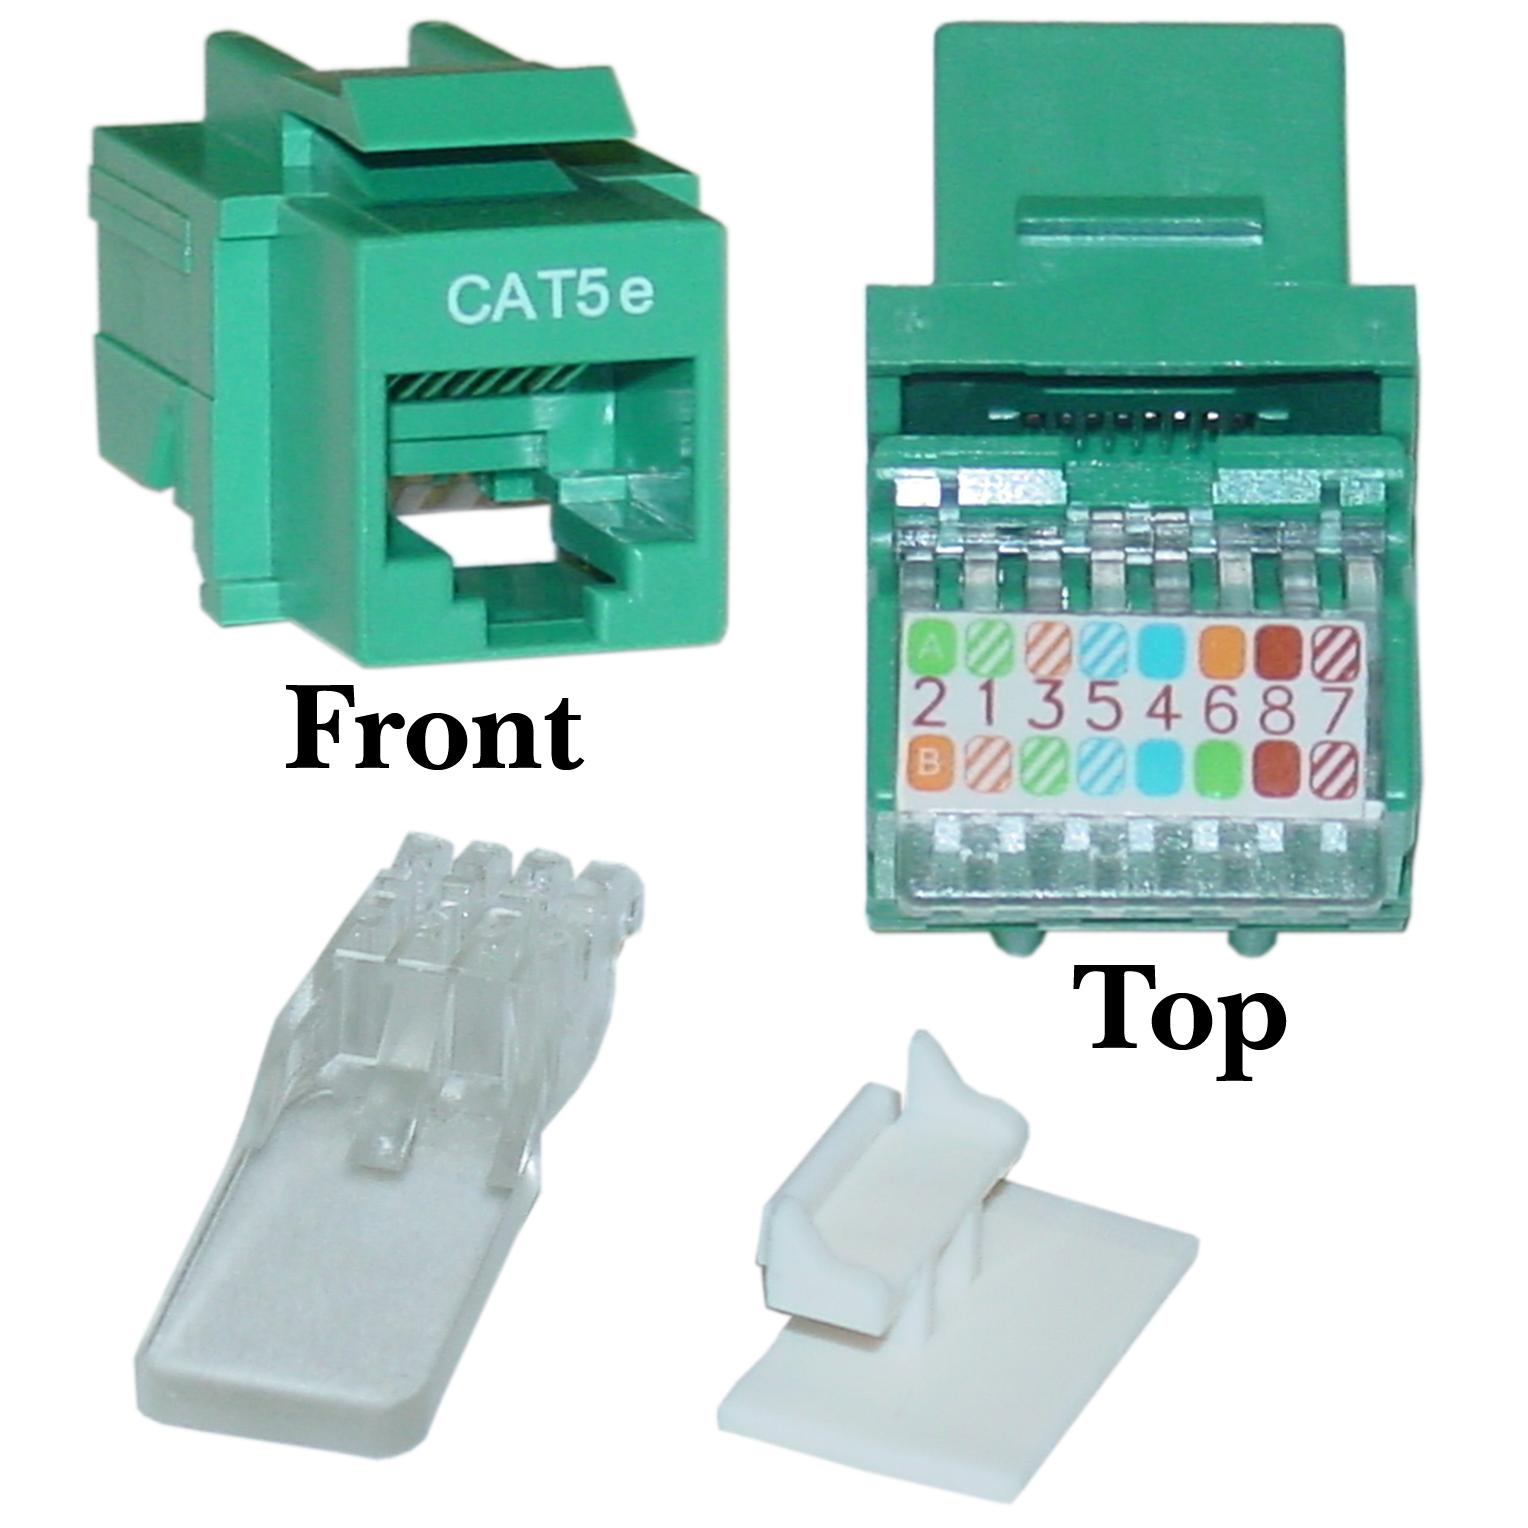 Cat5 Rj45 Wiring Diagram Keystone Jack Green Cat5e Rj45 Keystone Jack Toolless